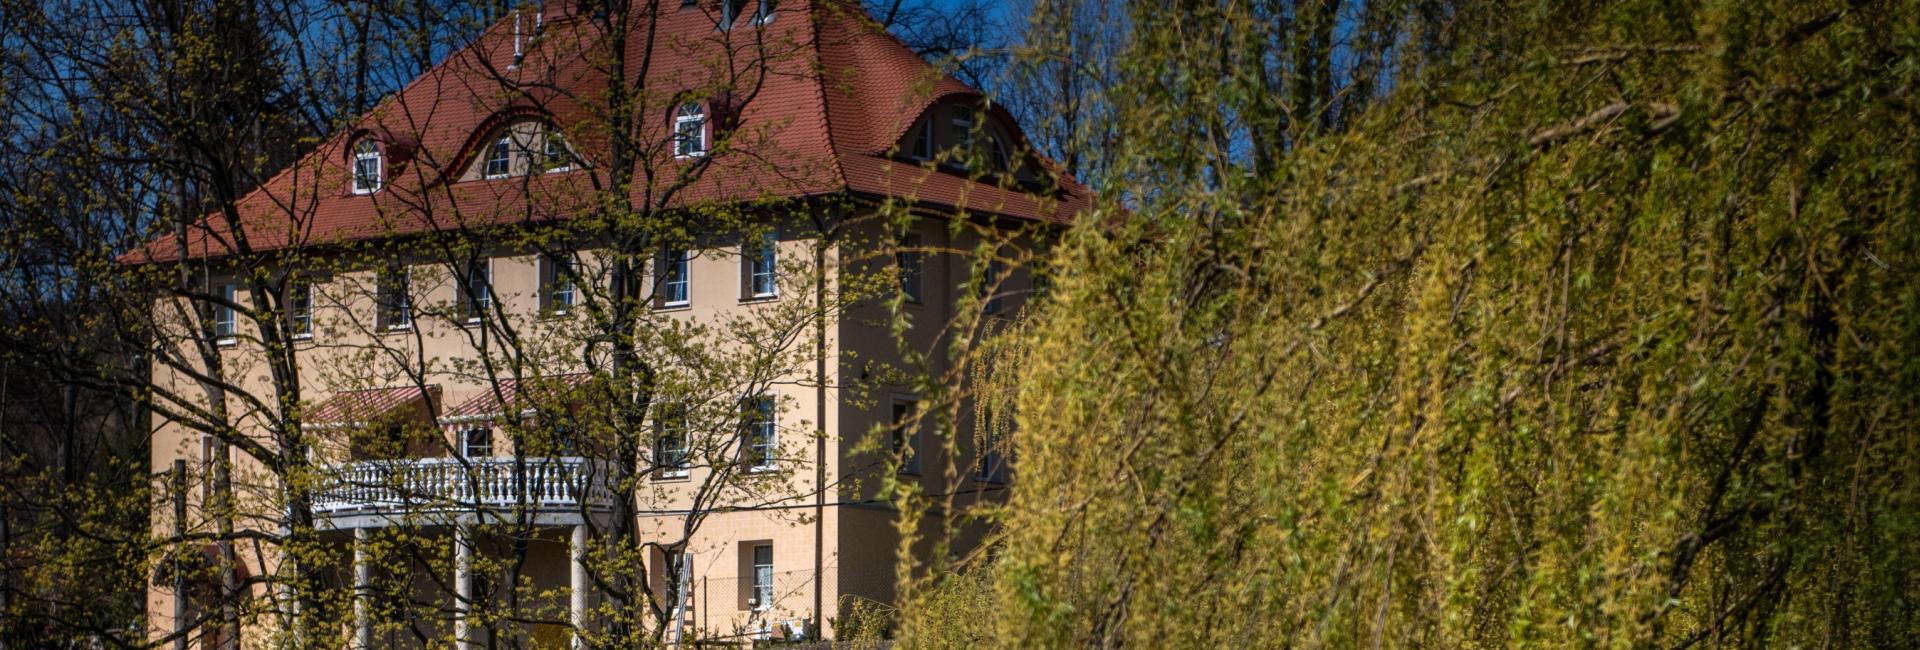 Grawert Residence in Lądek Zdroj, Dolny Slask